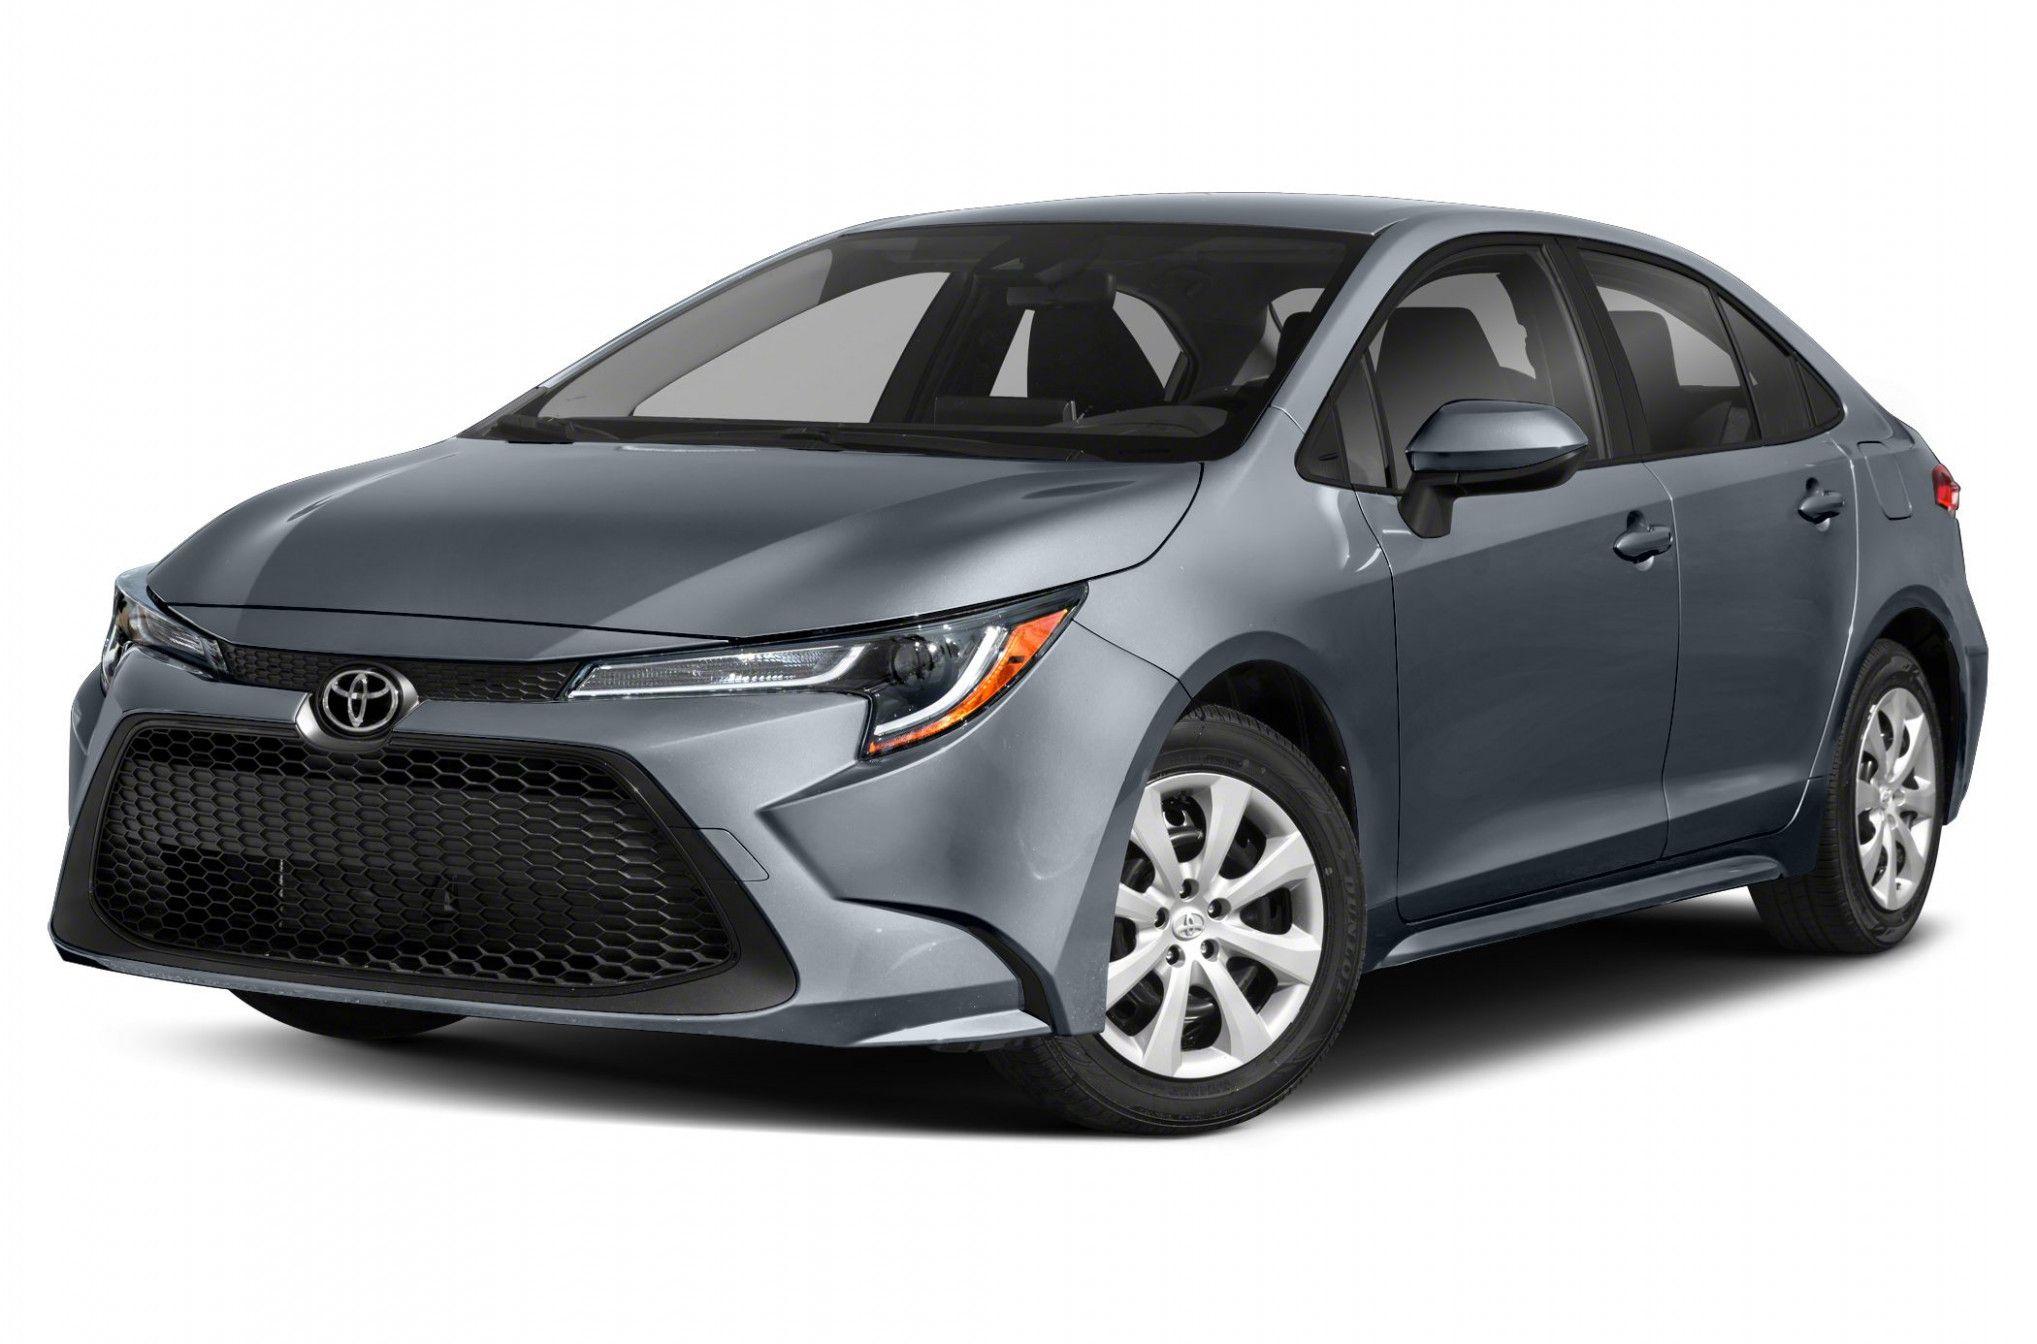 2020 Toyota Corolla For Sale In 2020 Toyota Corolla Toyota Corolla Le Toyota Cars